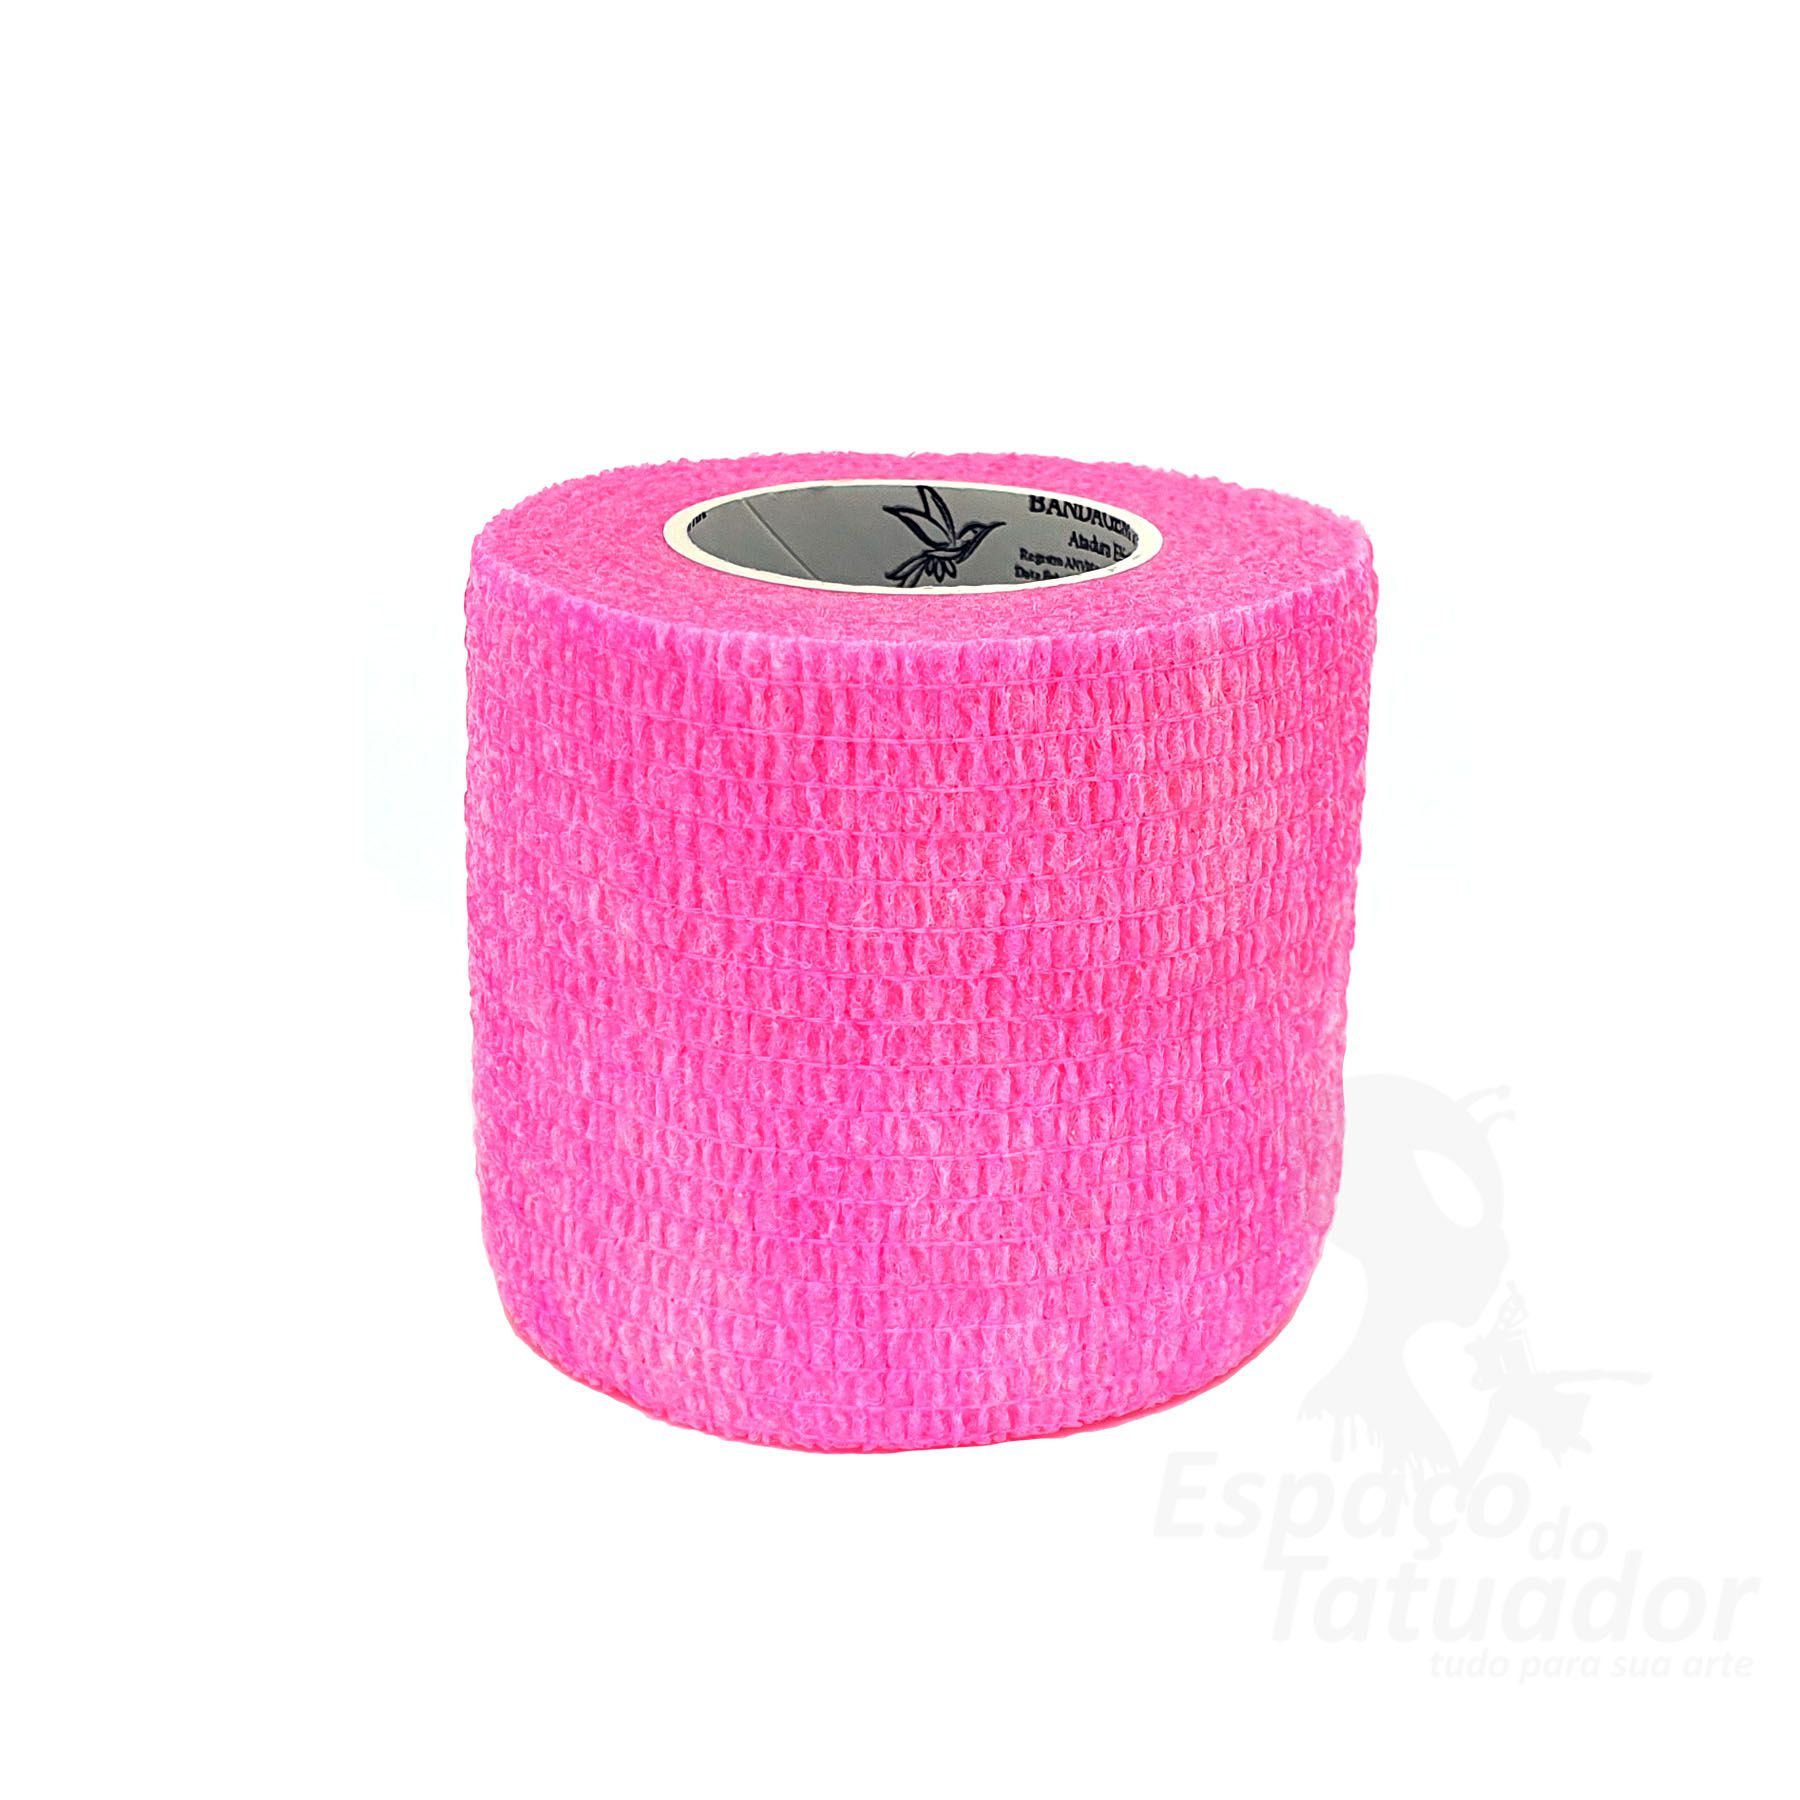 Bandagem Custom Phantom HK - 5cm x 4,5m - Fluo Pink